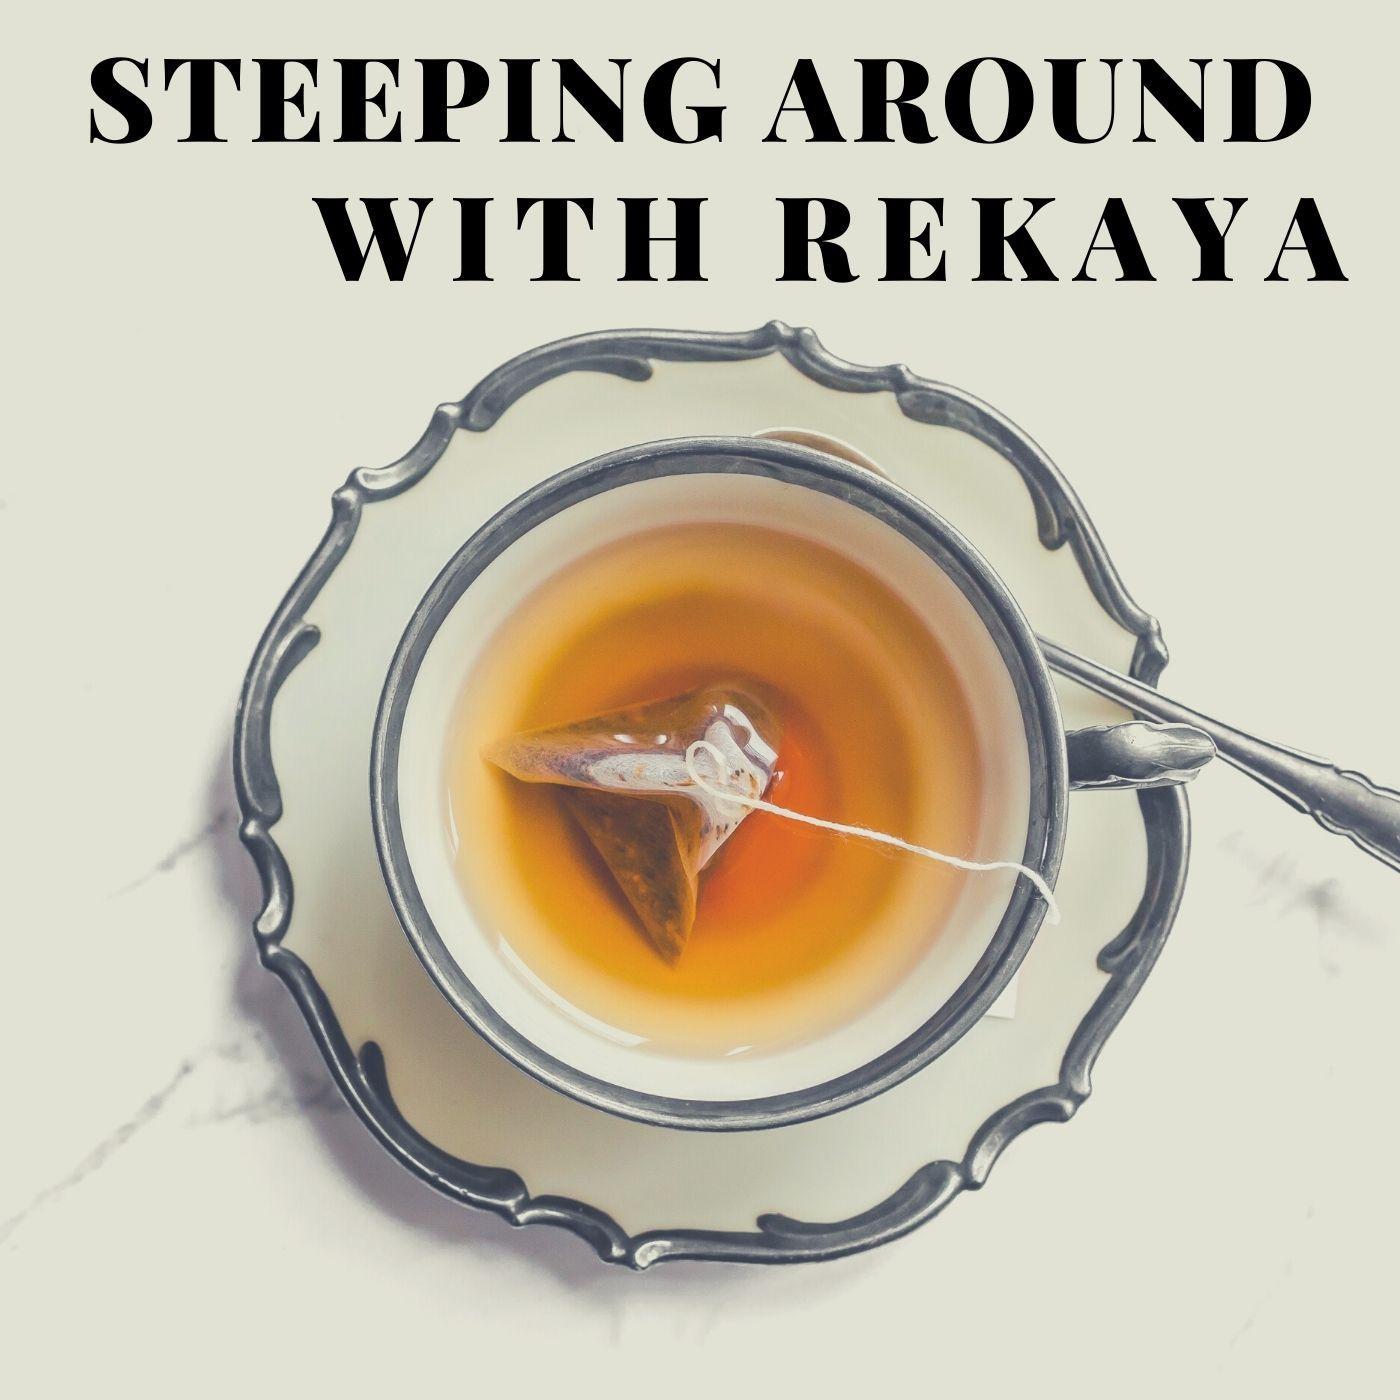 Steeping Around With Rekaya